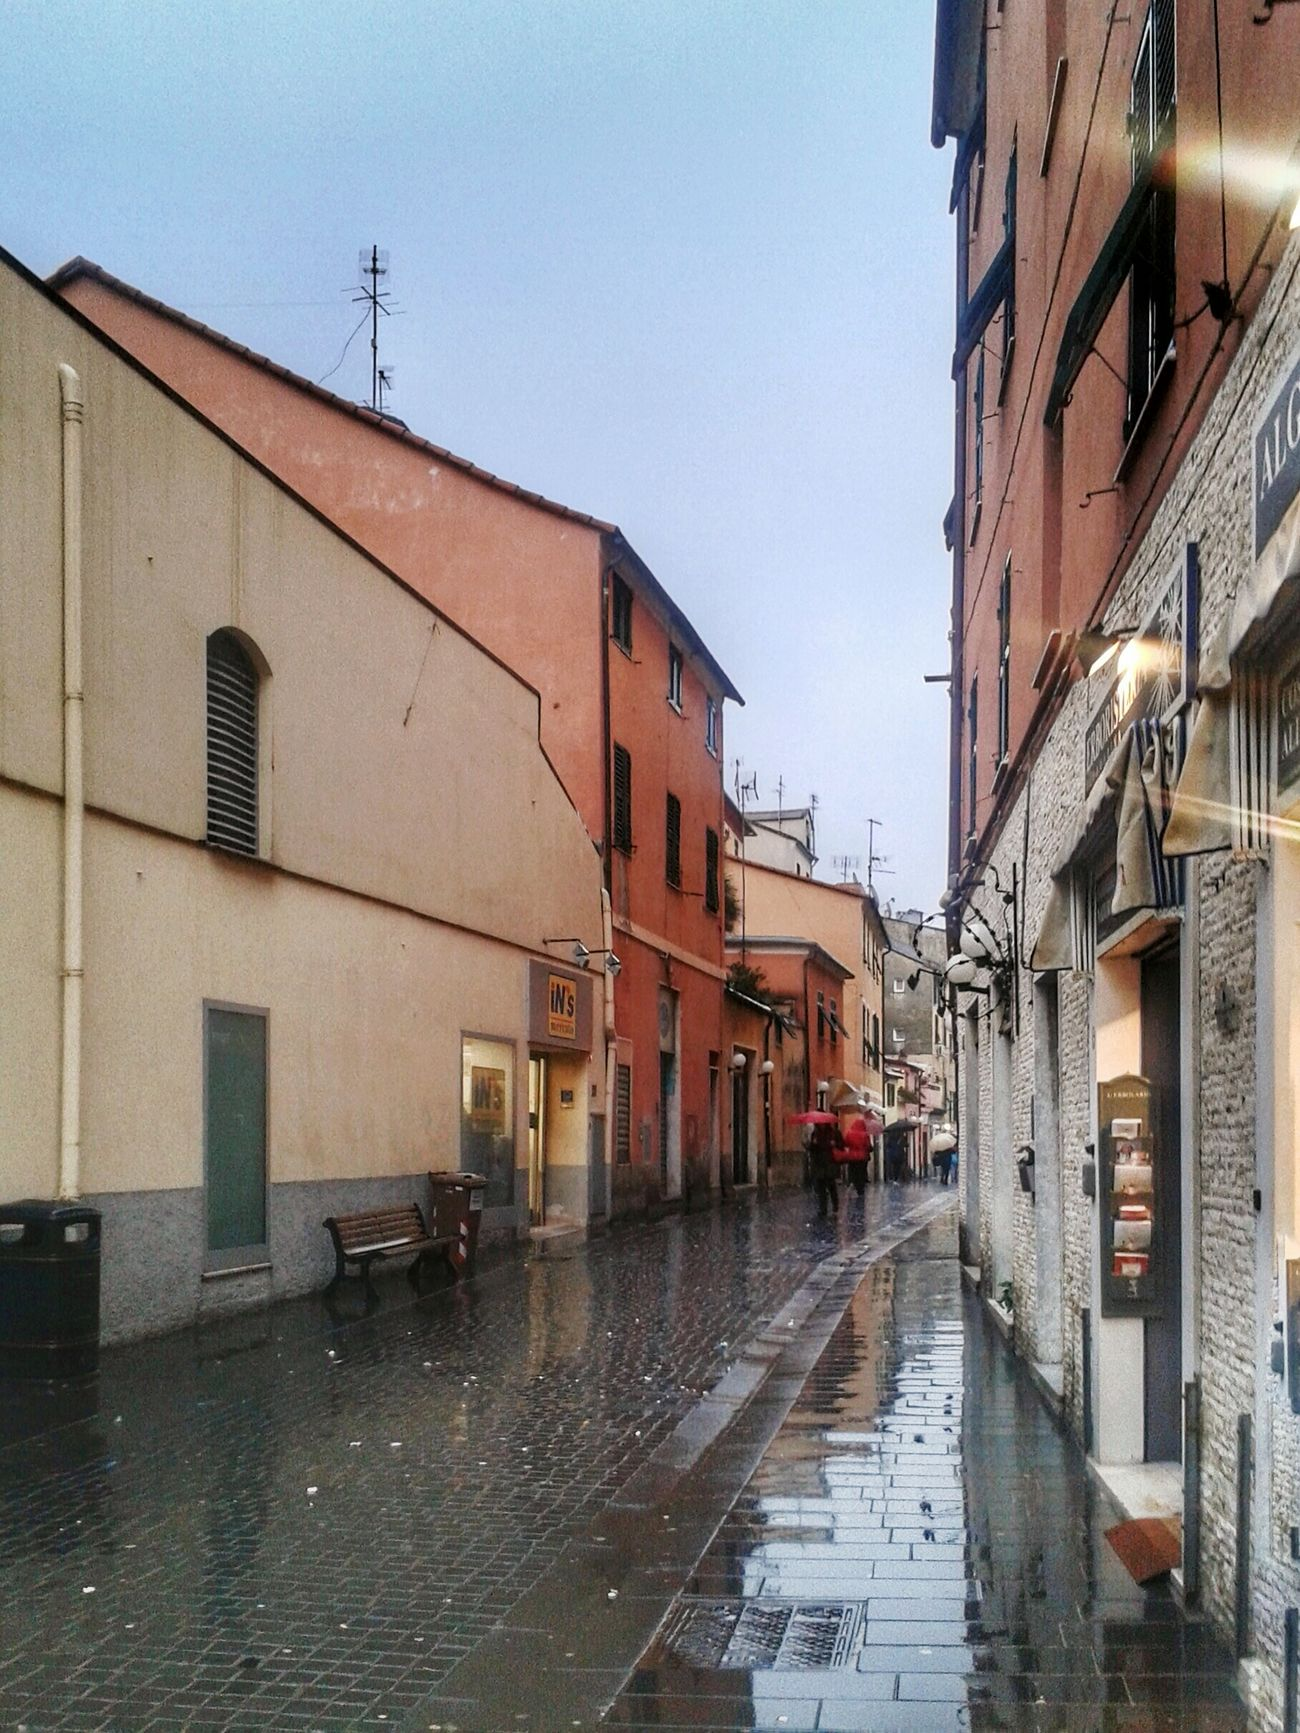 """Giornata uggiosa"". Rainy Days Rain After The Rain Street Photography Street / Pedestrian Street with no Pedestrians / No People Reflection / Smartphone Photography Mobile Photography with S3mini and Camerazoomfx in HDR shooting mode ( Multiple Exposures) / Eyeemfilter. In Genova-Pra' Italia"